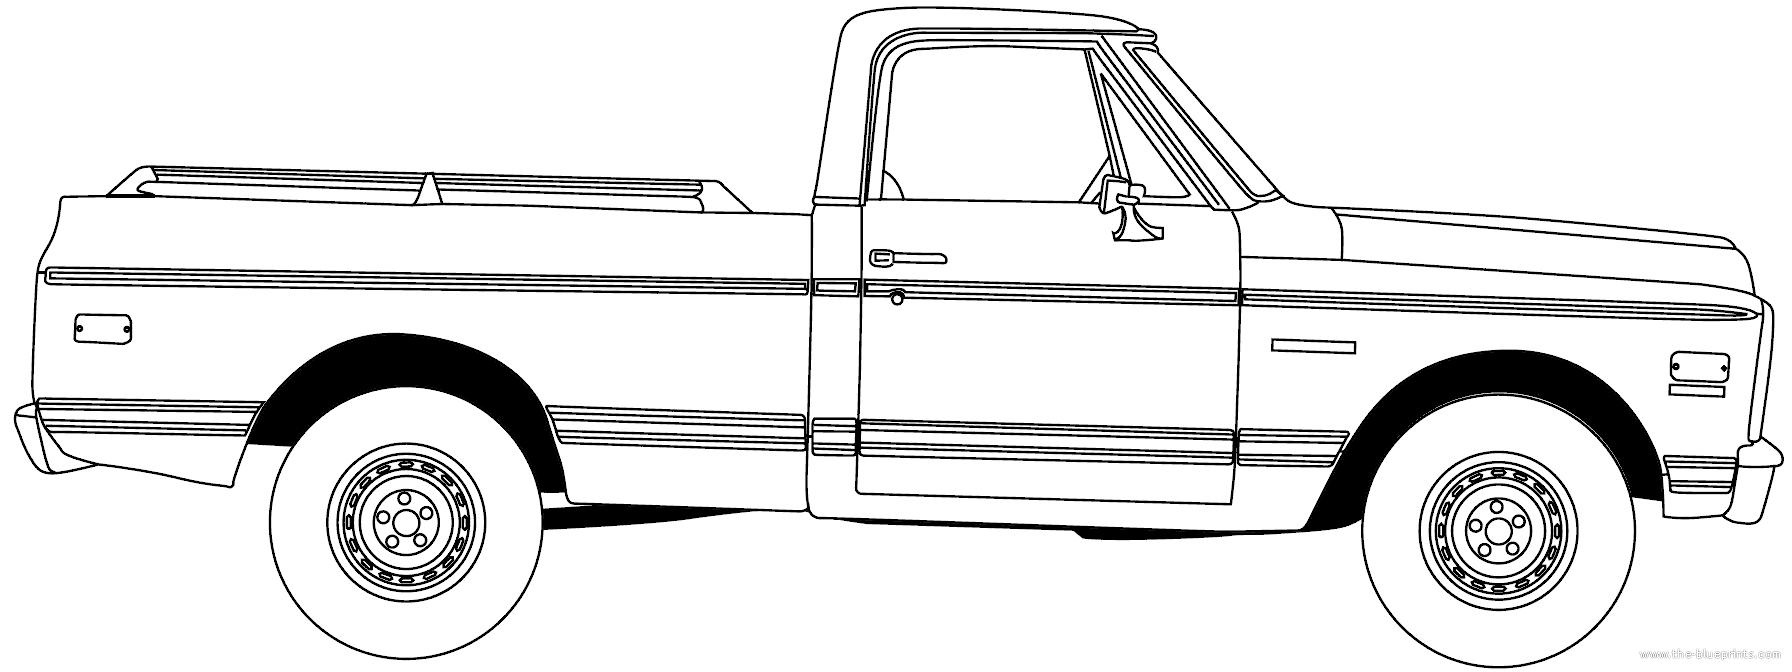 Blueprints > Cars > Chevrolet > Chevrolet C-K Pick-up (1986)